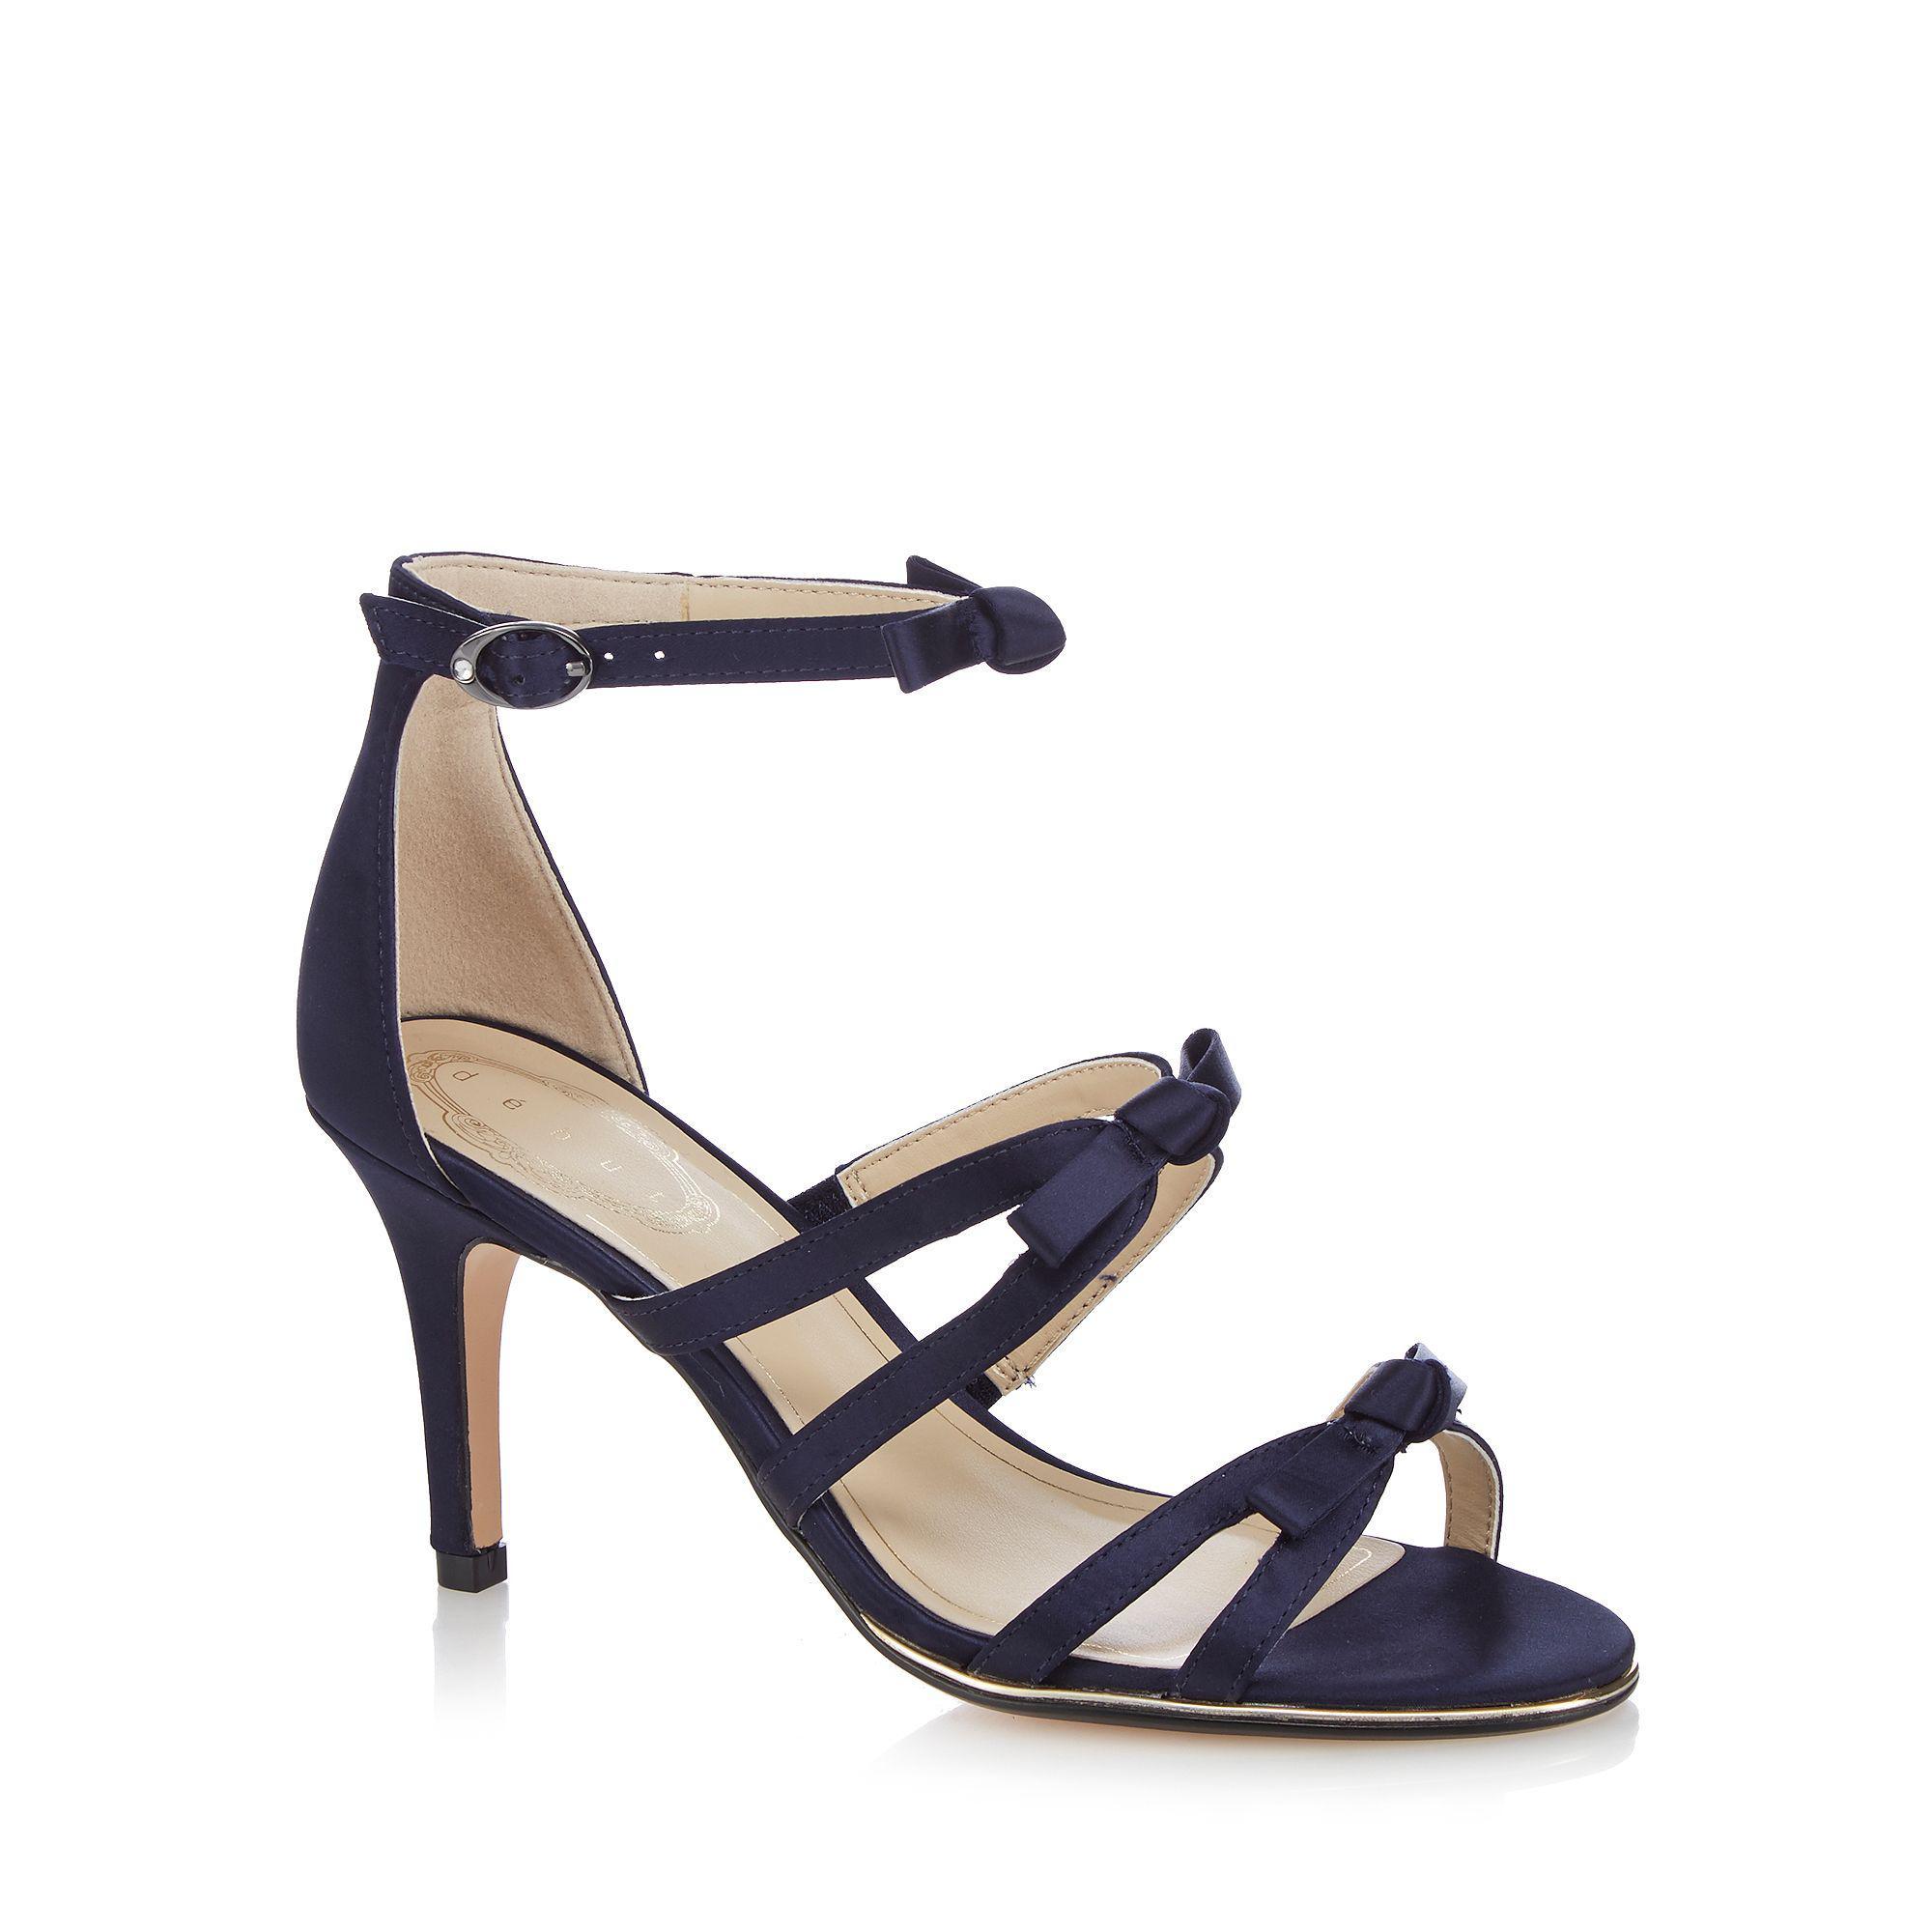 d297933d769 Début Navy  drew  High Stiletto Heel Ankle Strap Sandals in Blue - Lyst